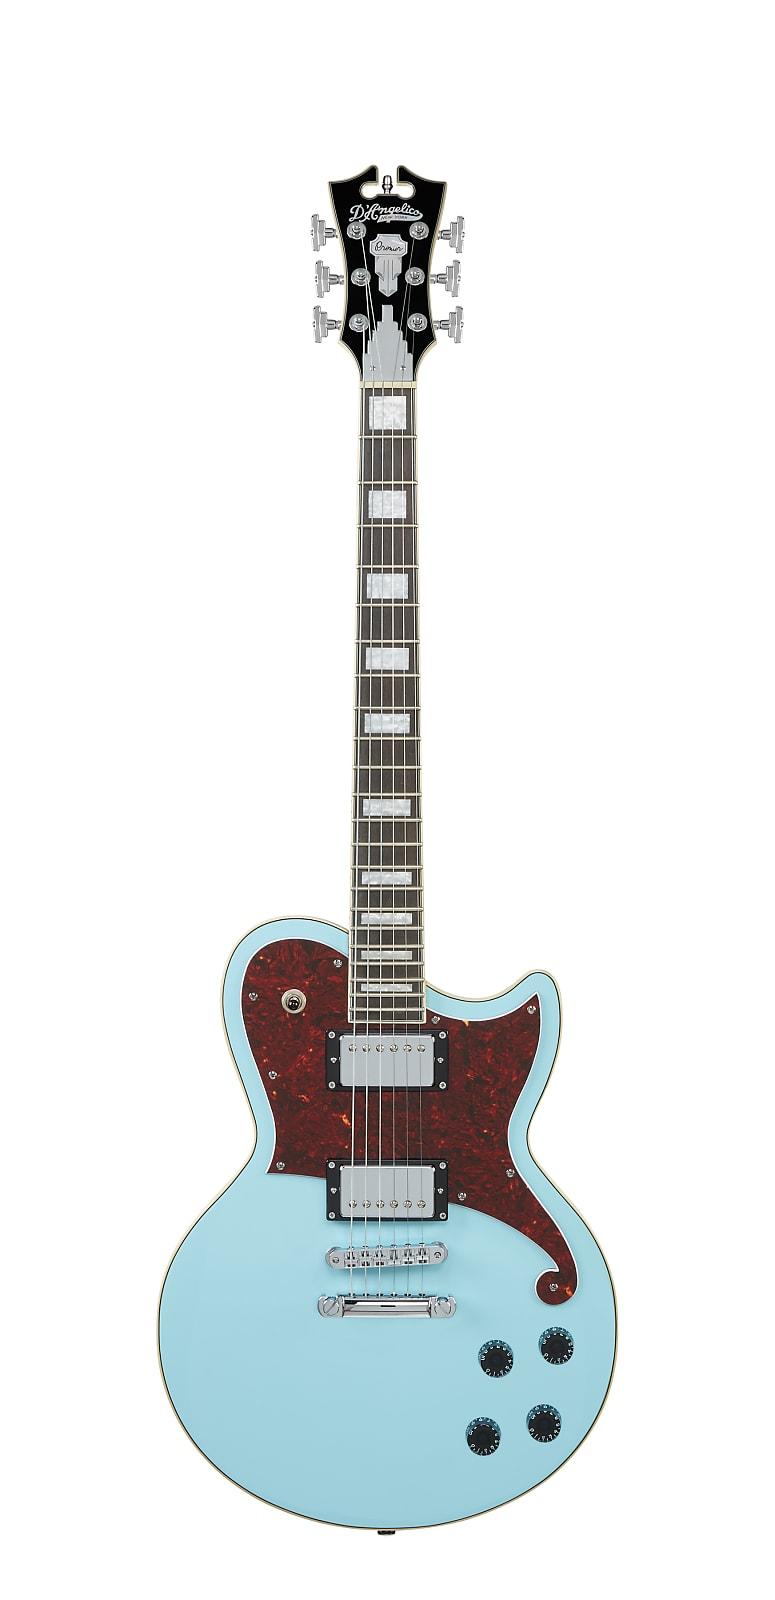 D'Angelico Premier Atlantic Singlecut Electric Guitar Sky Blue w/ Gig Bag